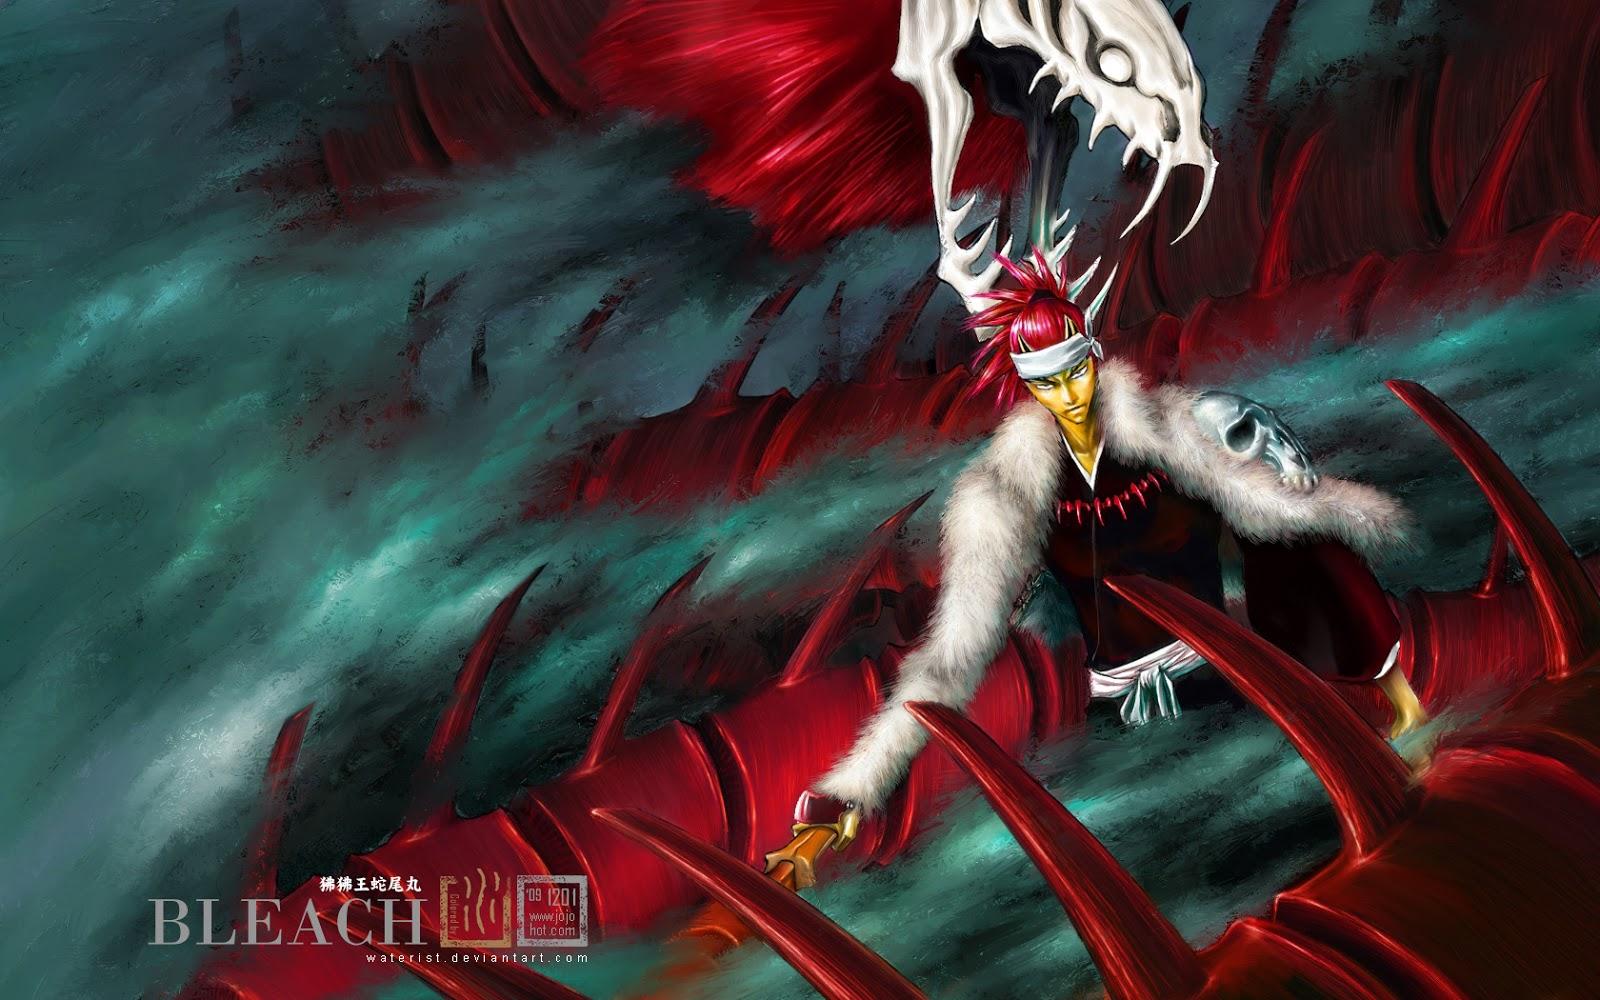 The Memoirs Of A Bleach Zealot Fantasy II Round 20 Renji Abarai Vs Squall Leonhart